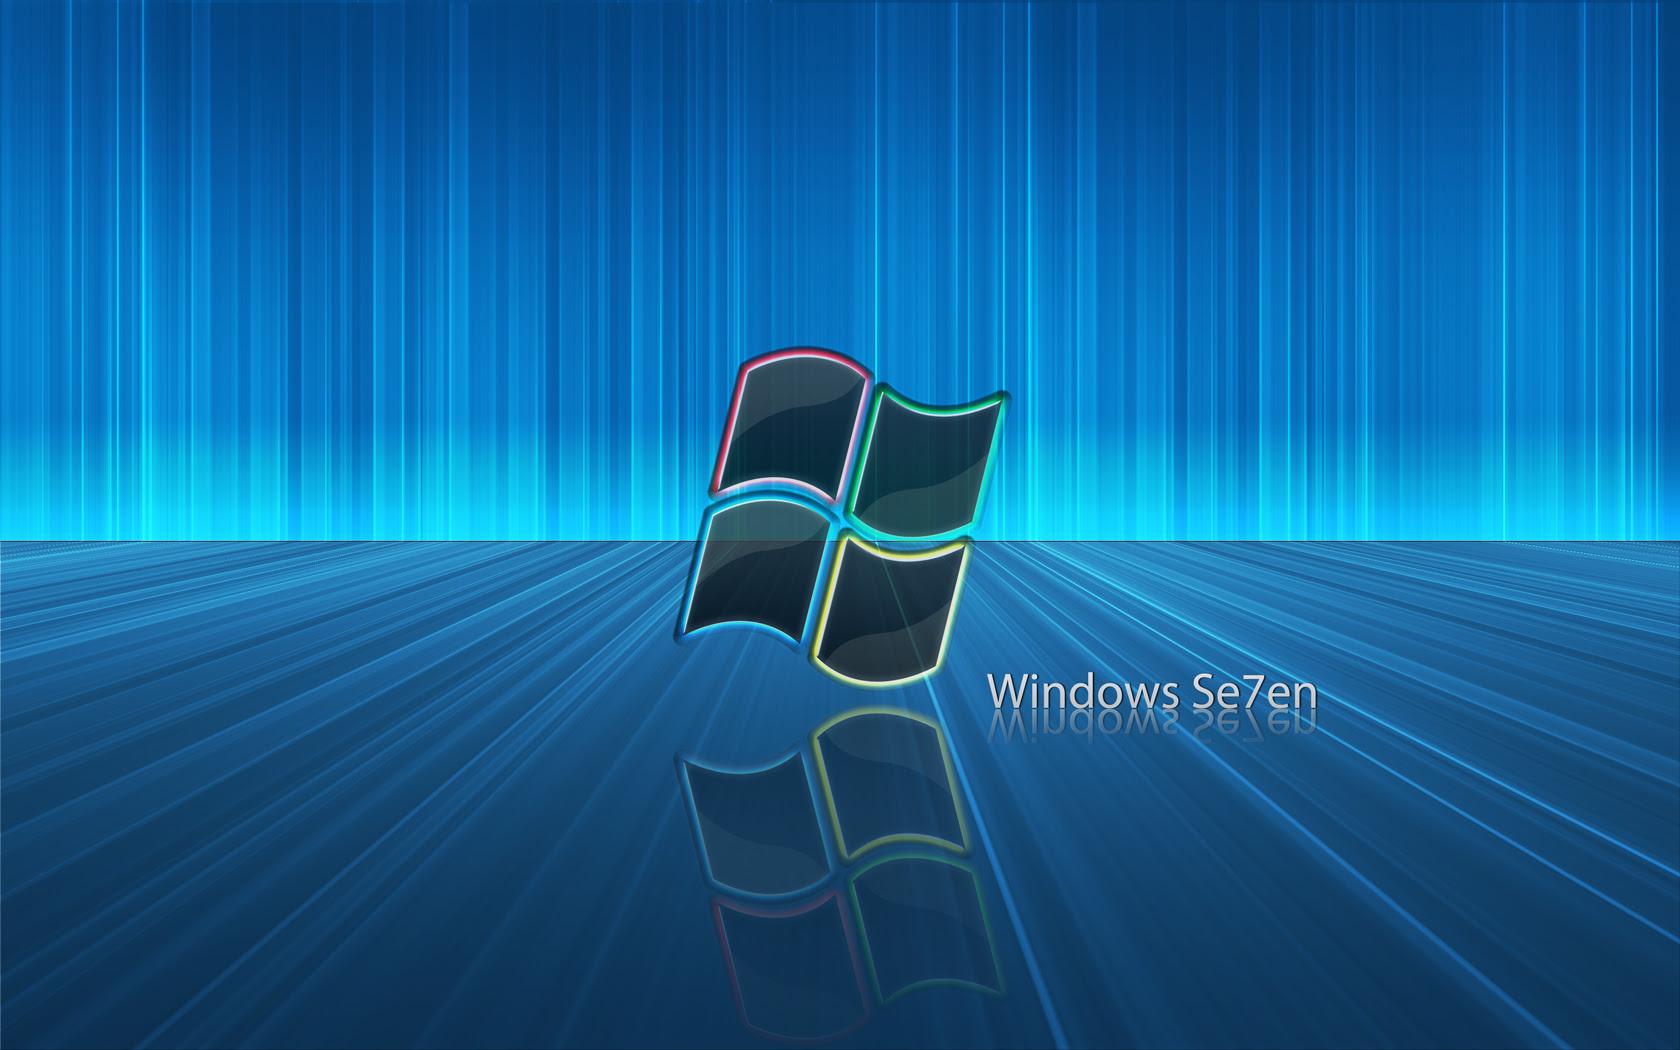 22 Gorgeous Windows 7 Wallpapers \u2013 Blaberize